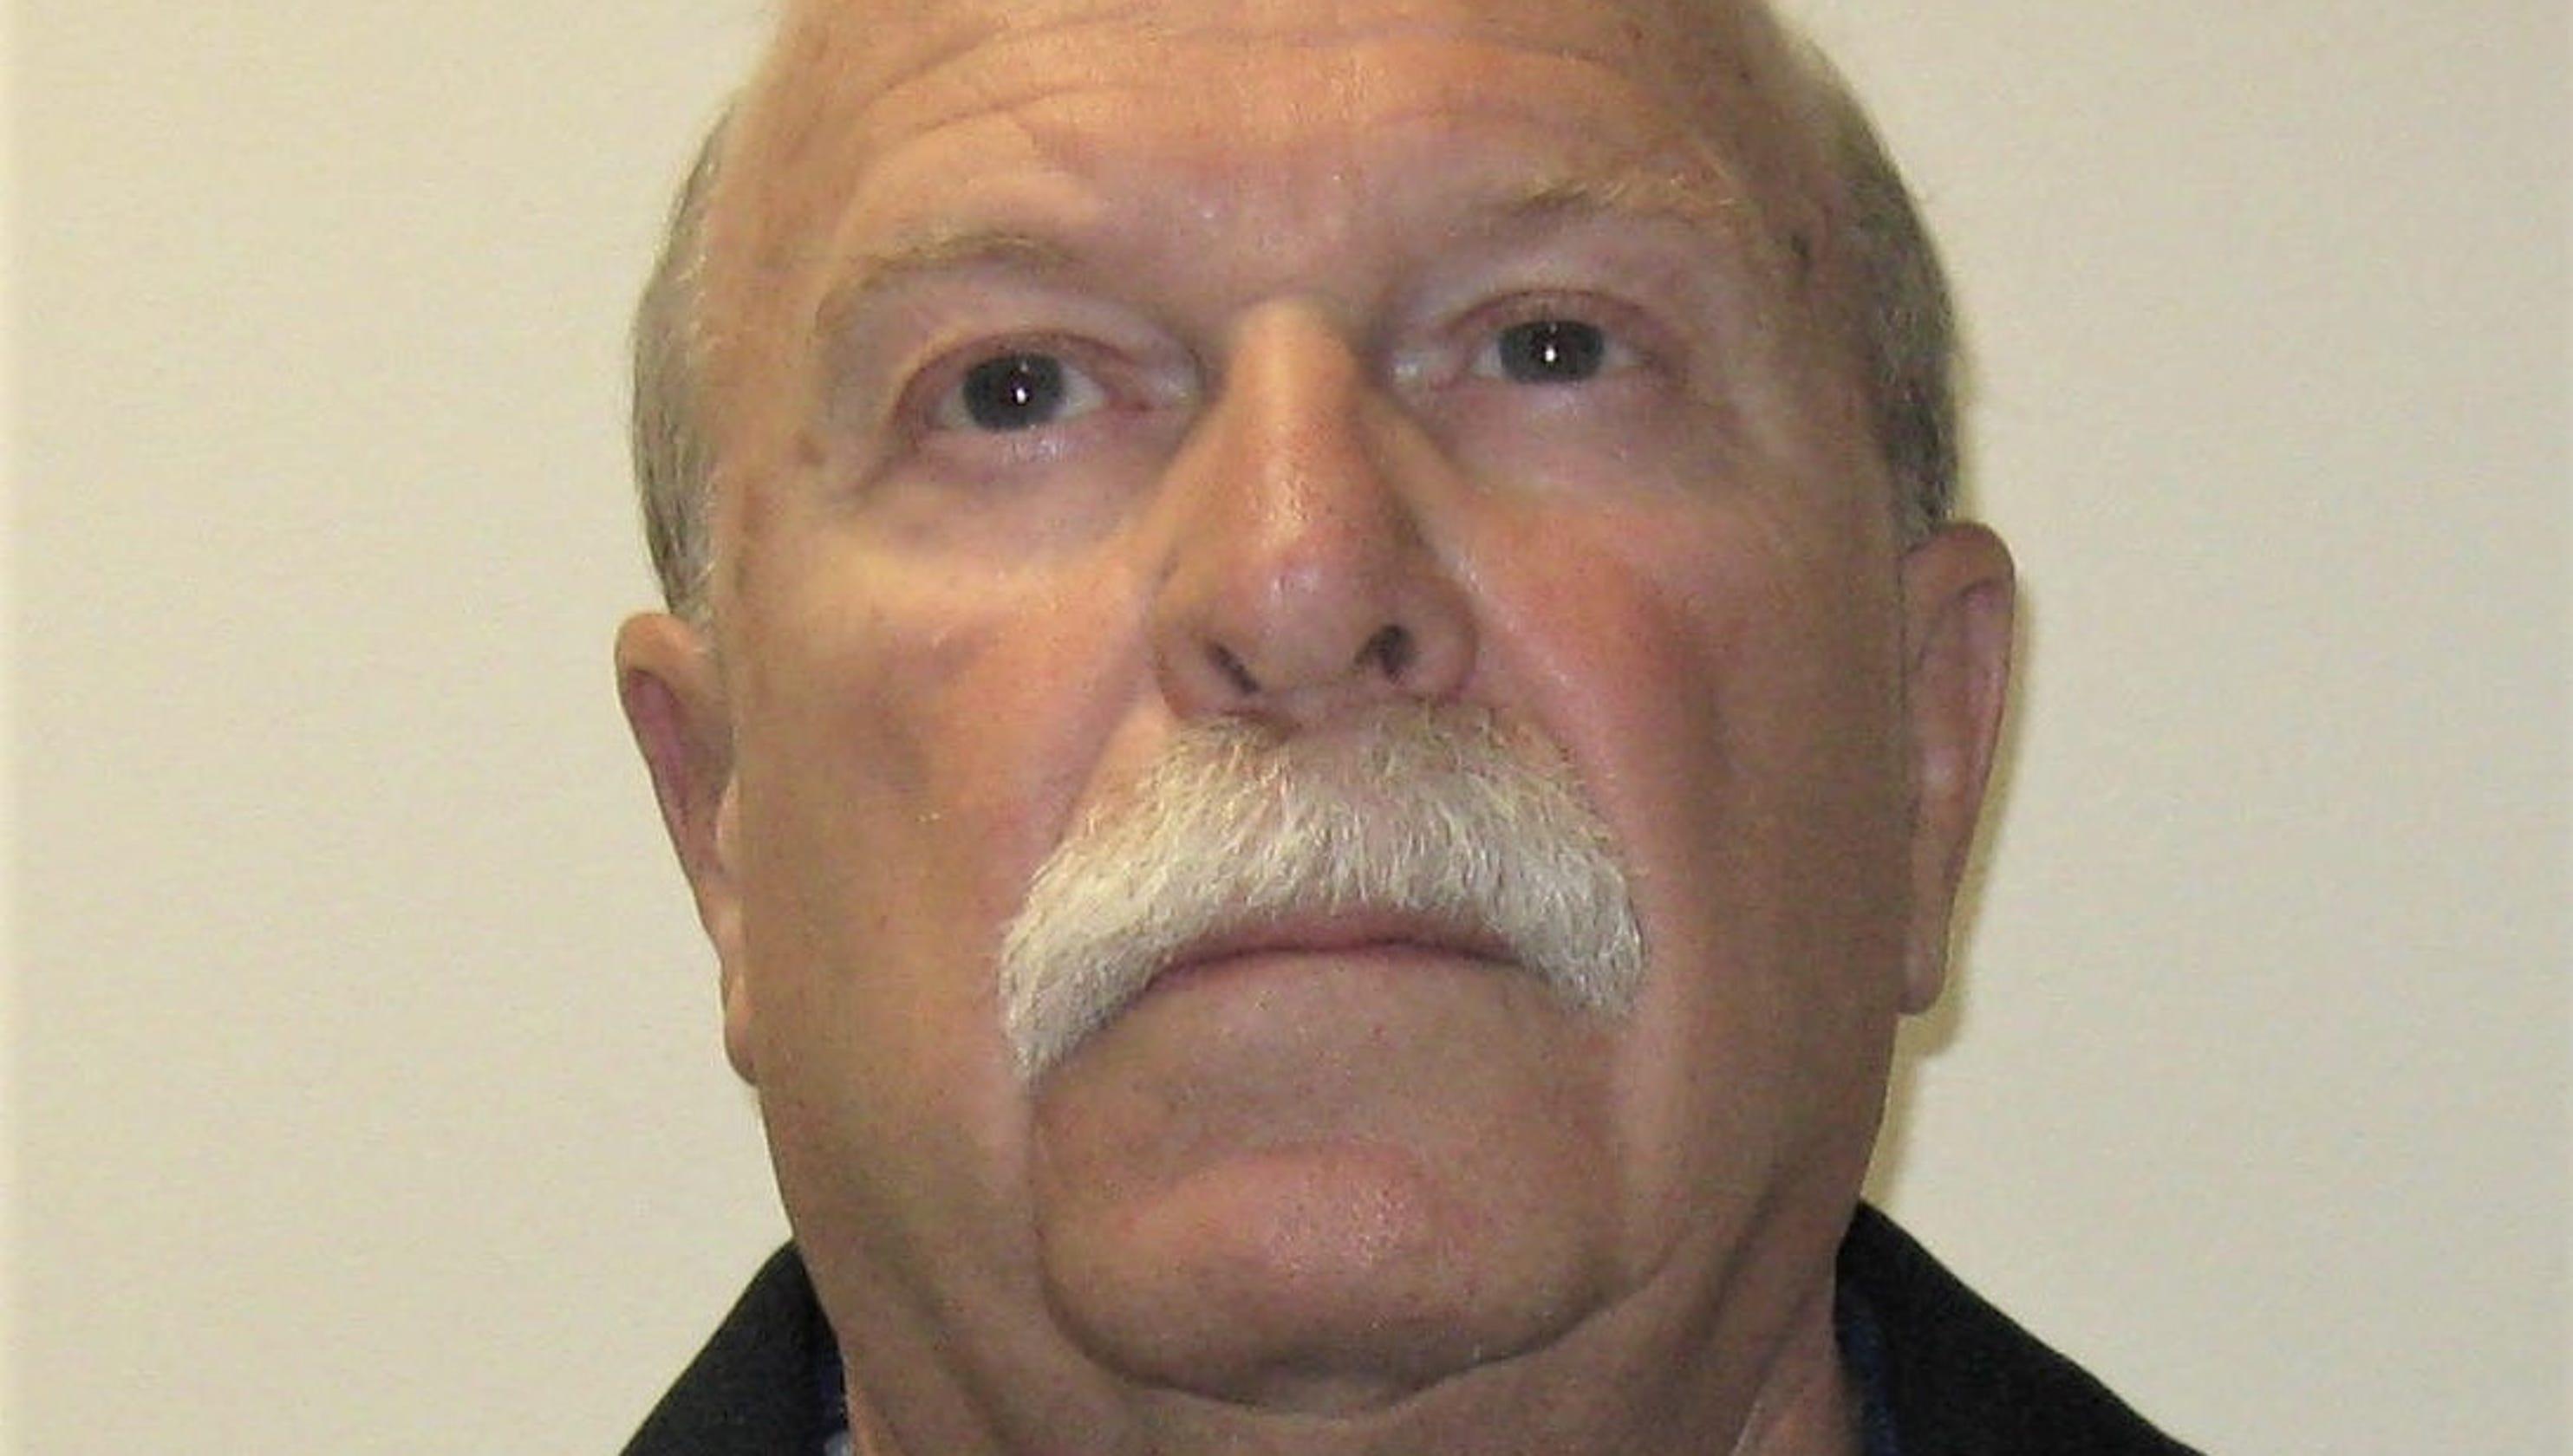 Burlington County Prosecutor's Office had sought 364-day sentence